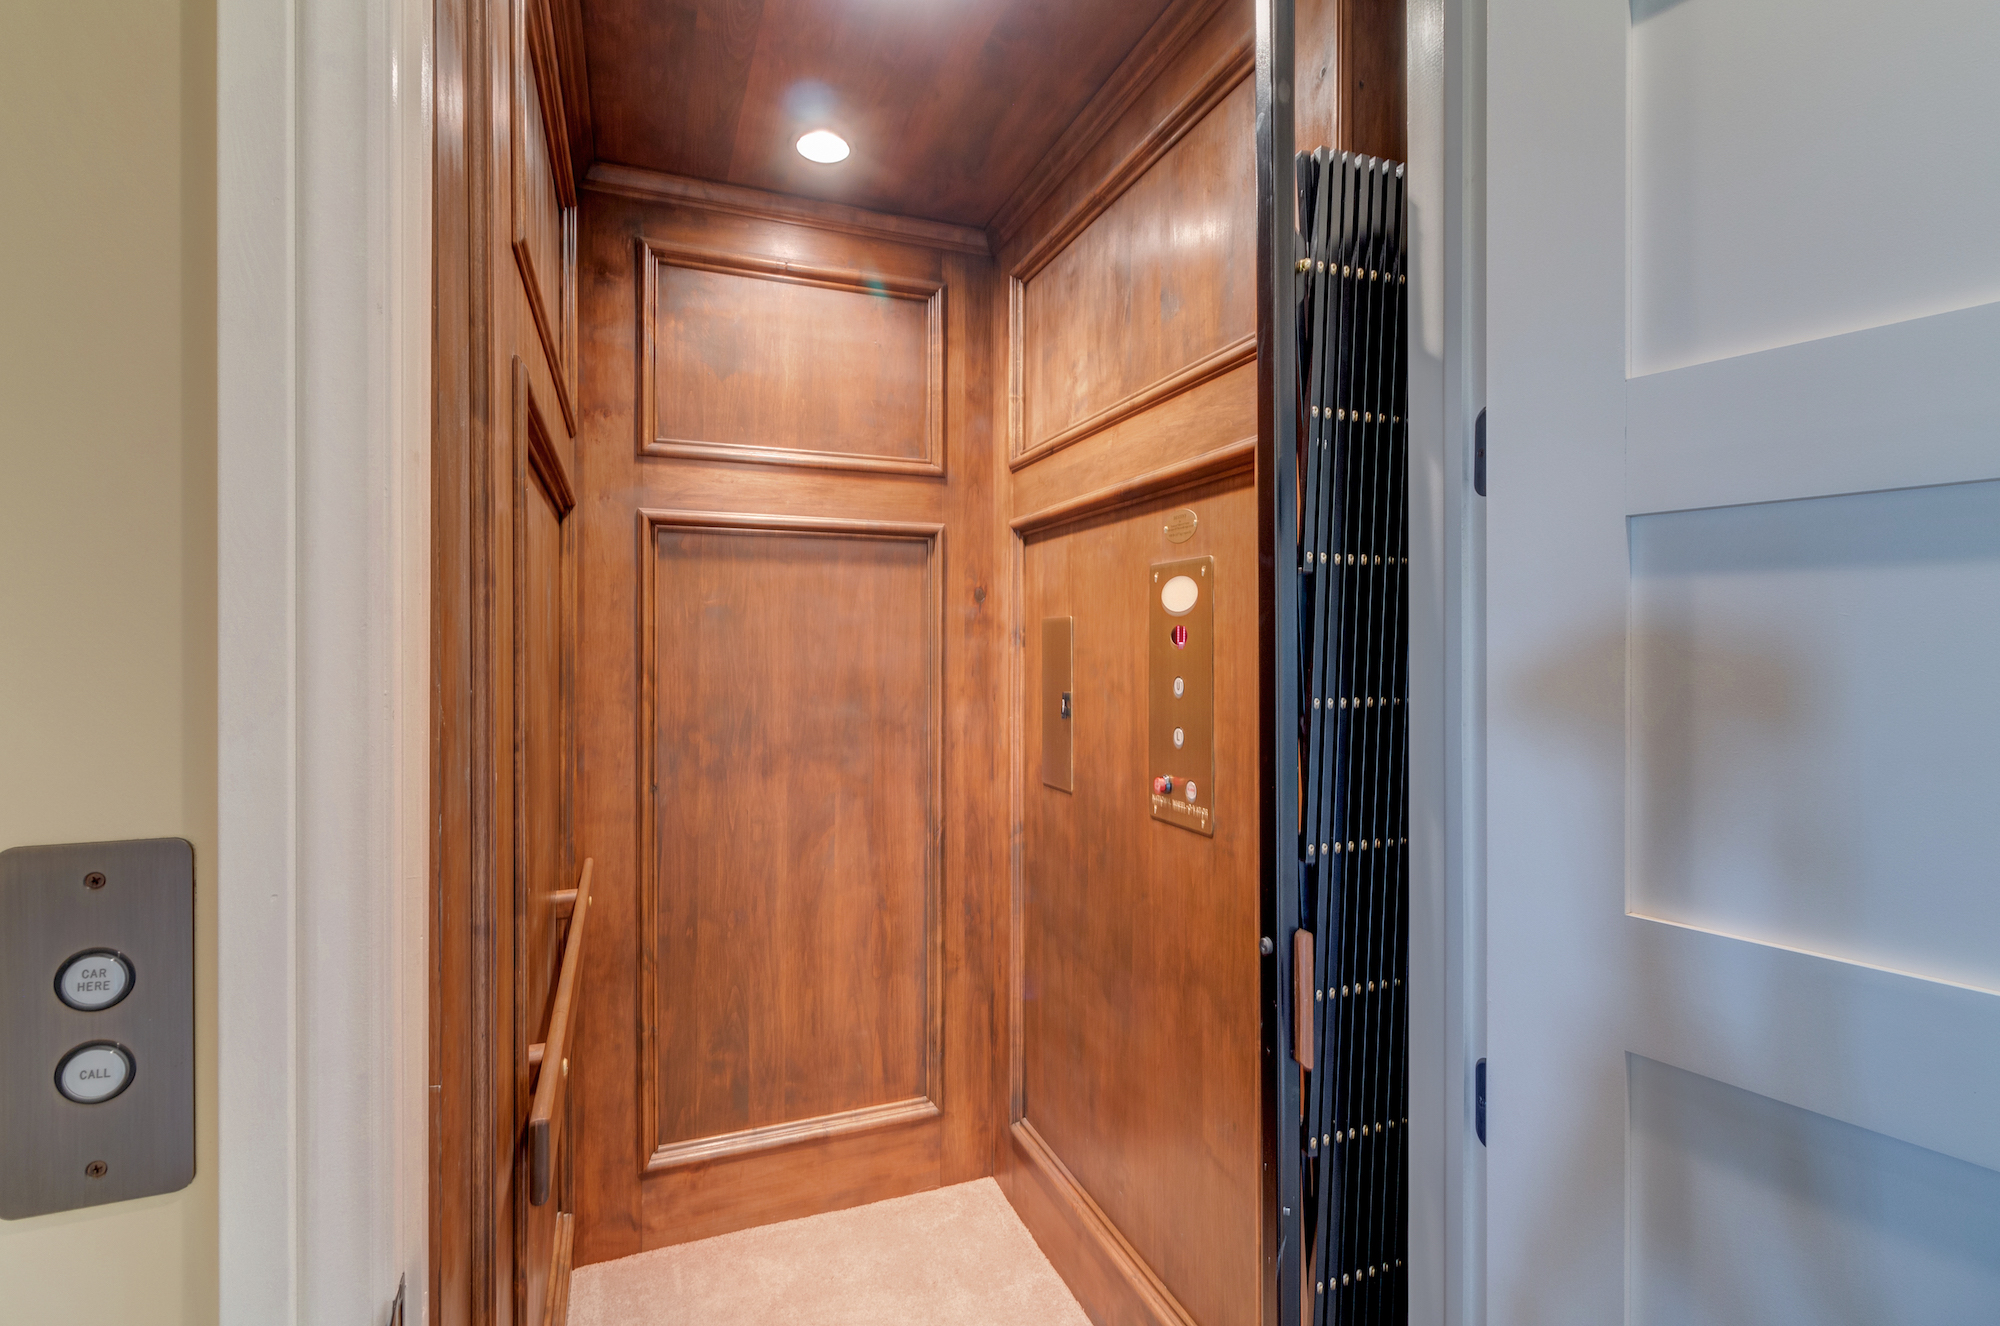 033-Elevator.jpg